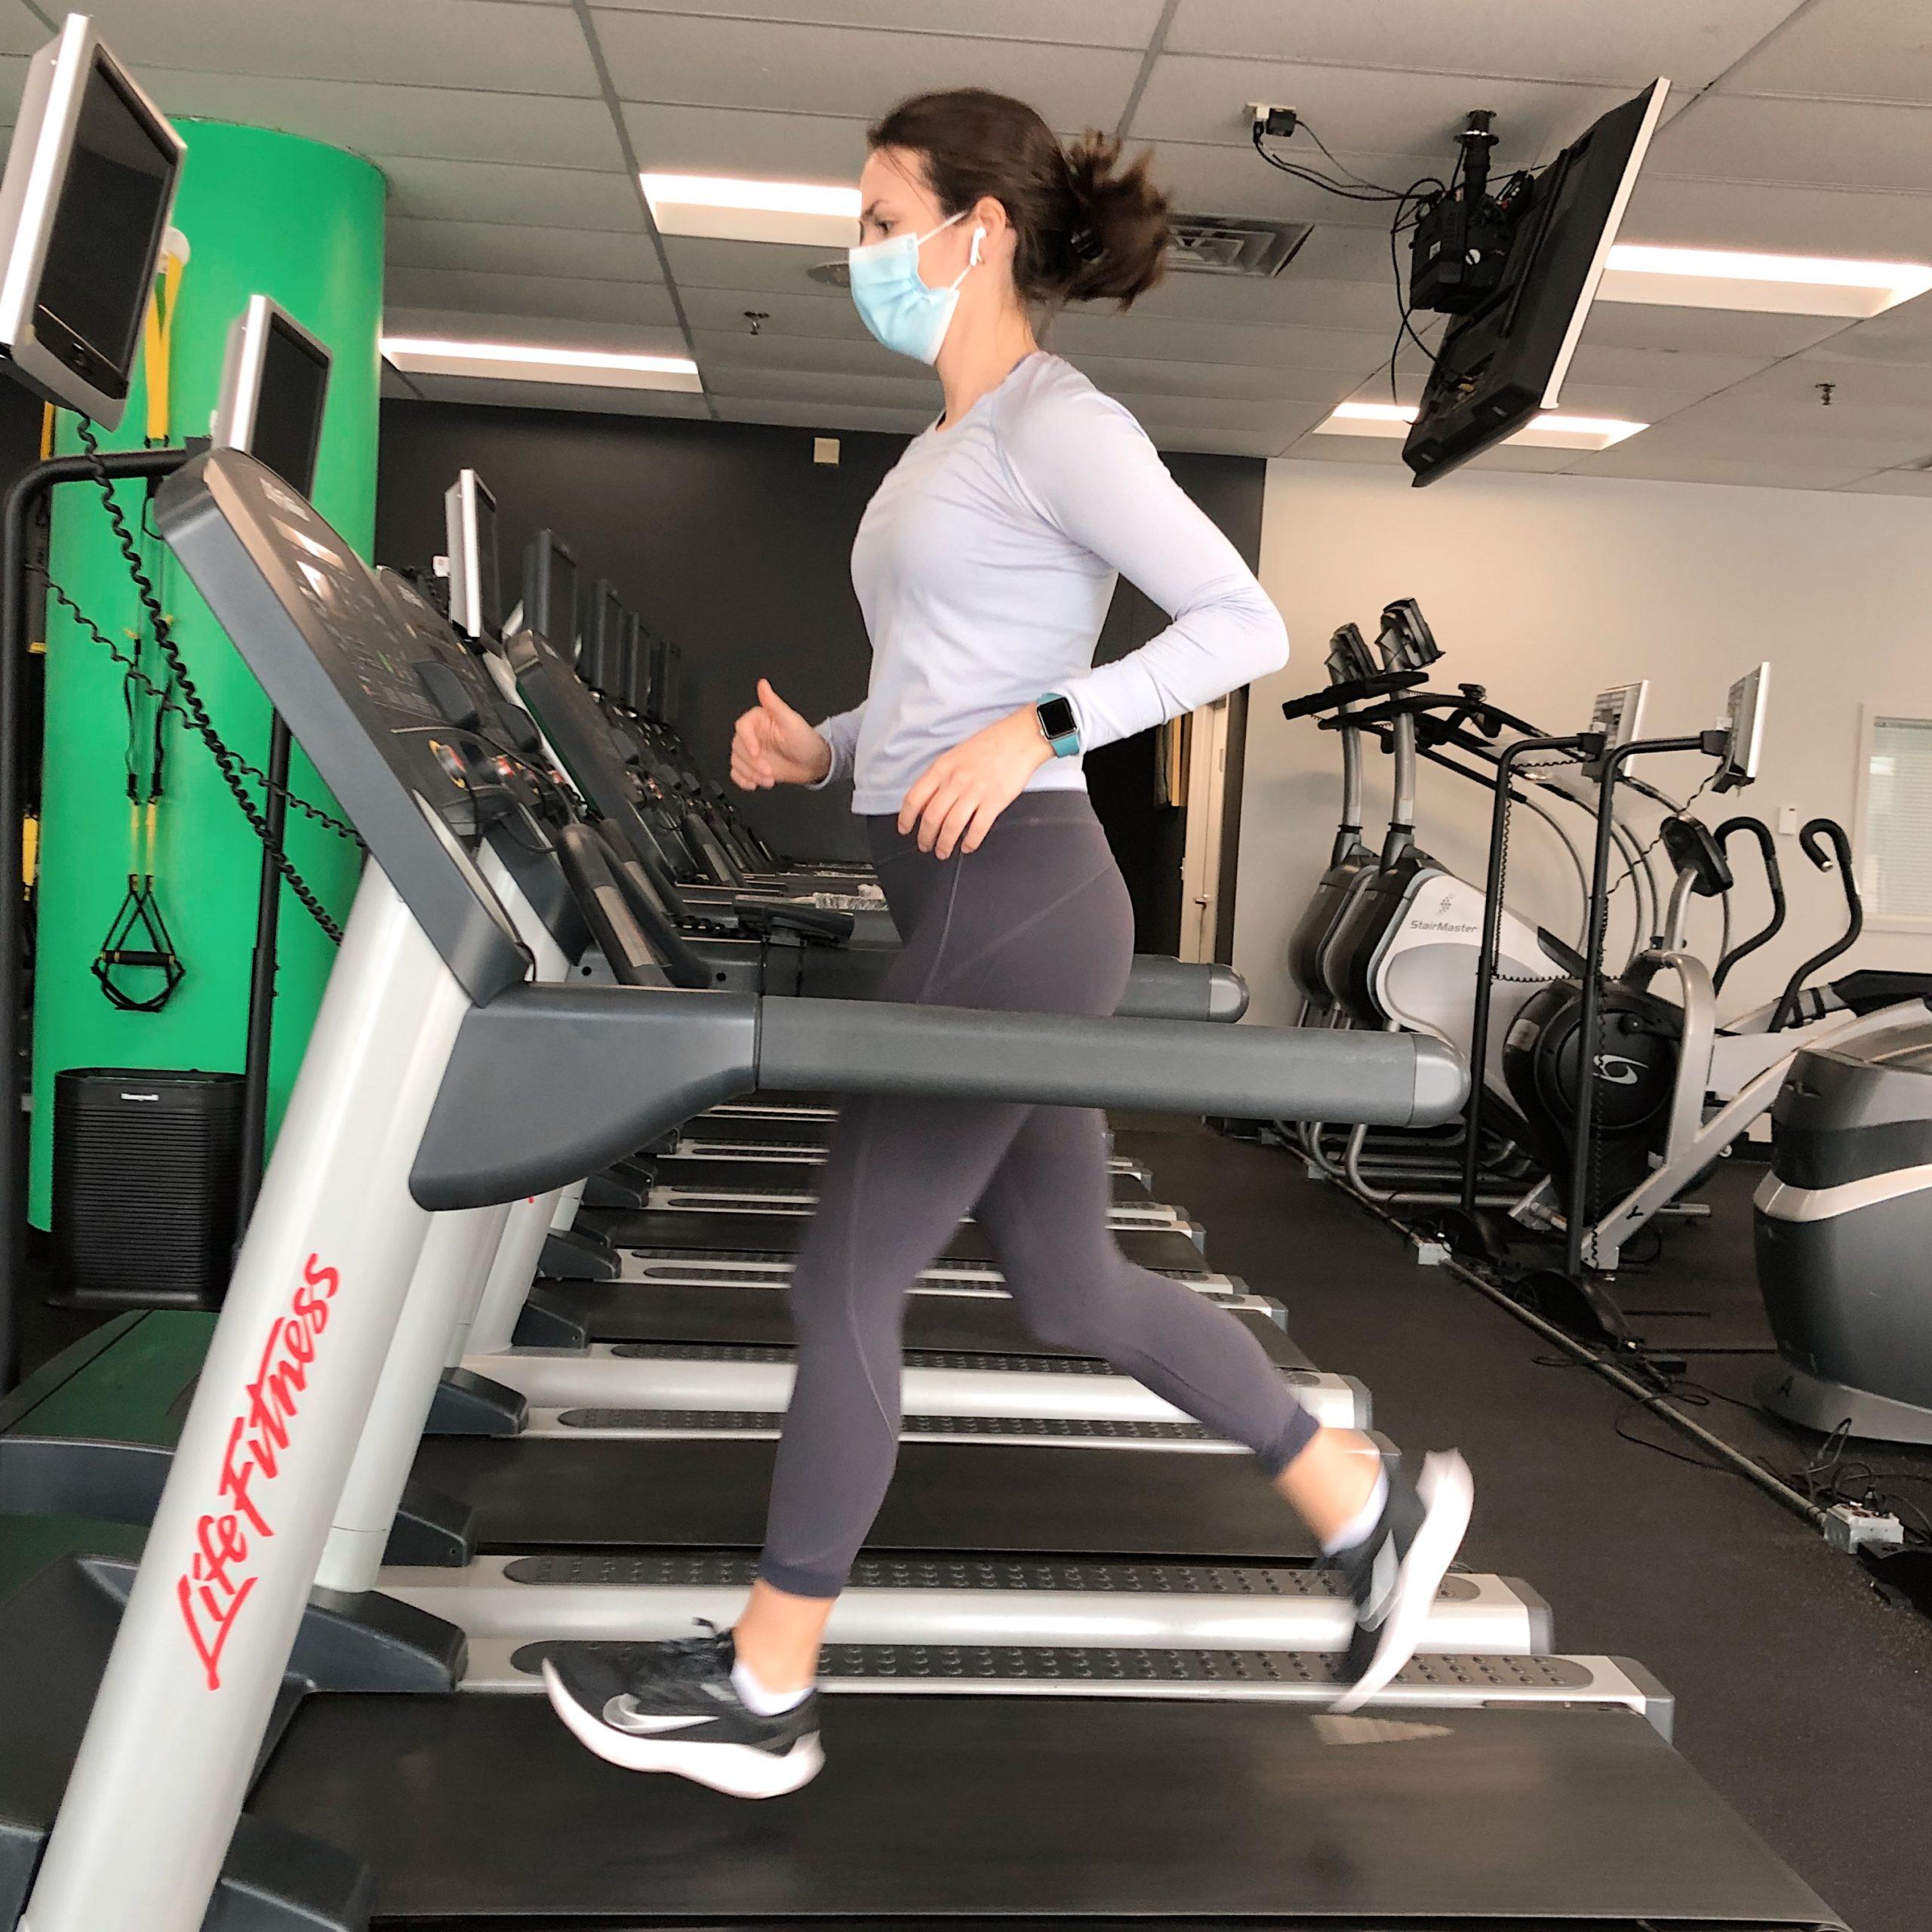 CSC Treadmill Cardio Workout